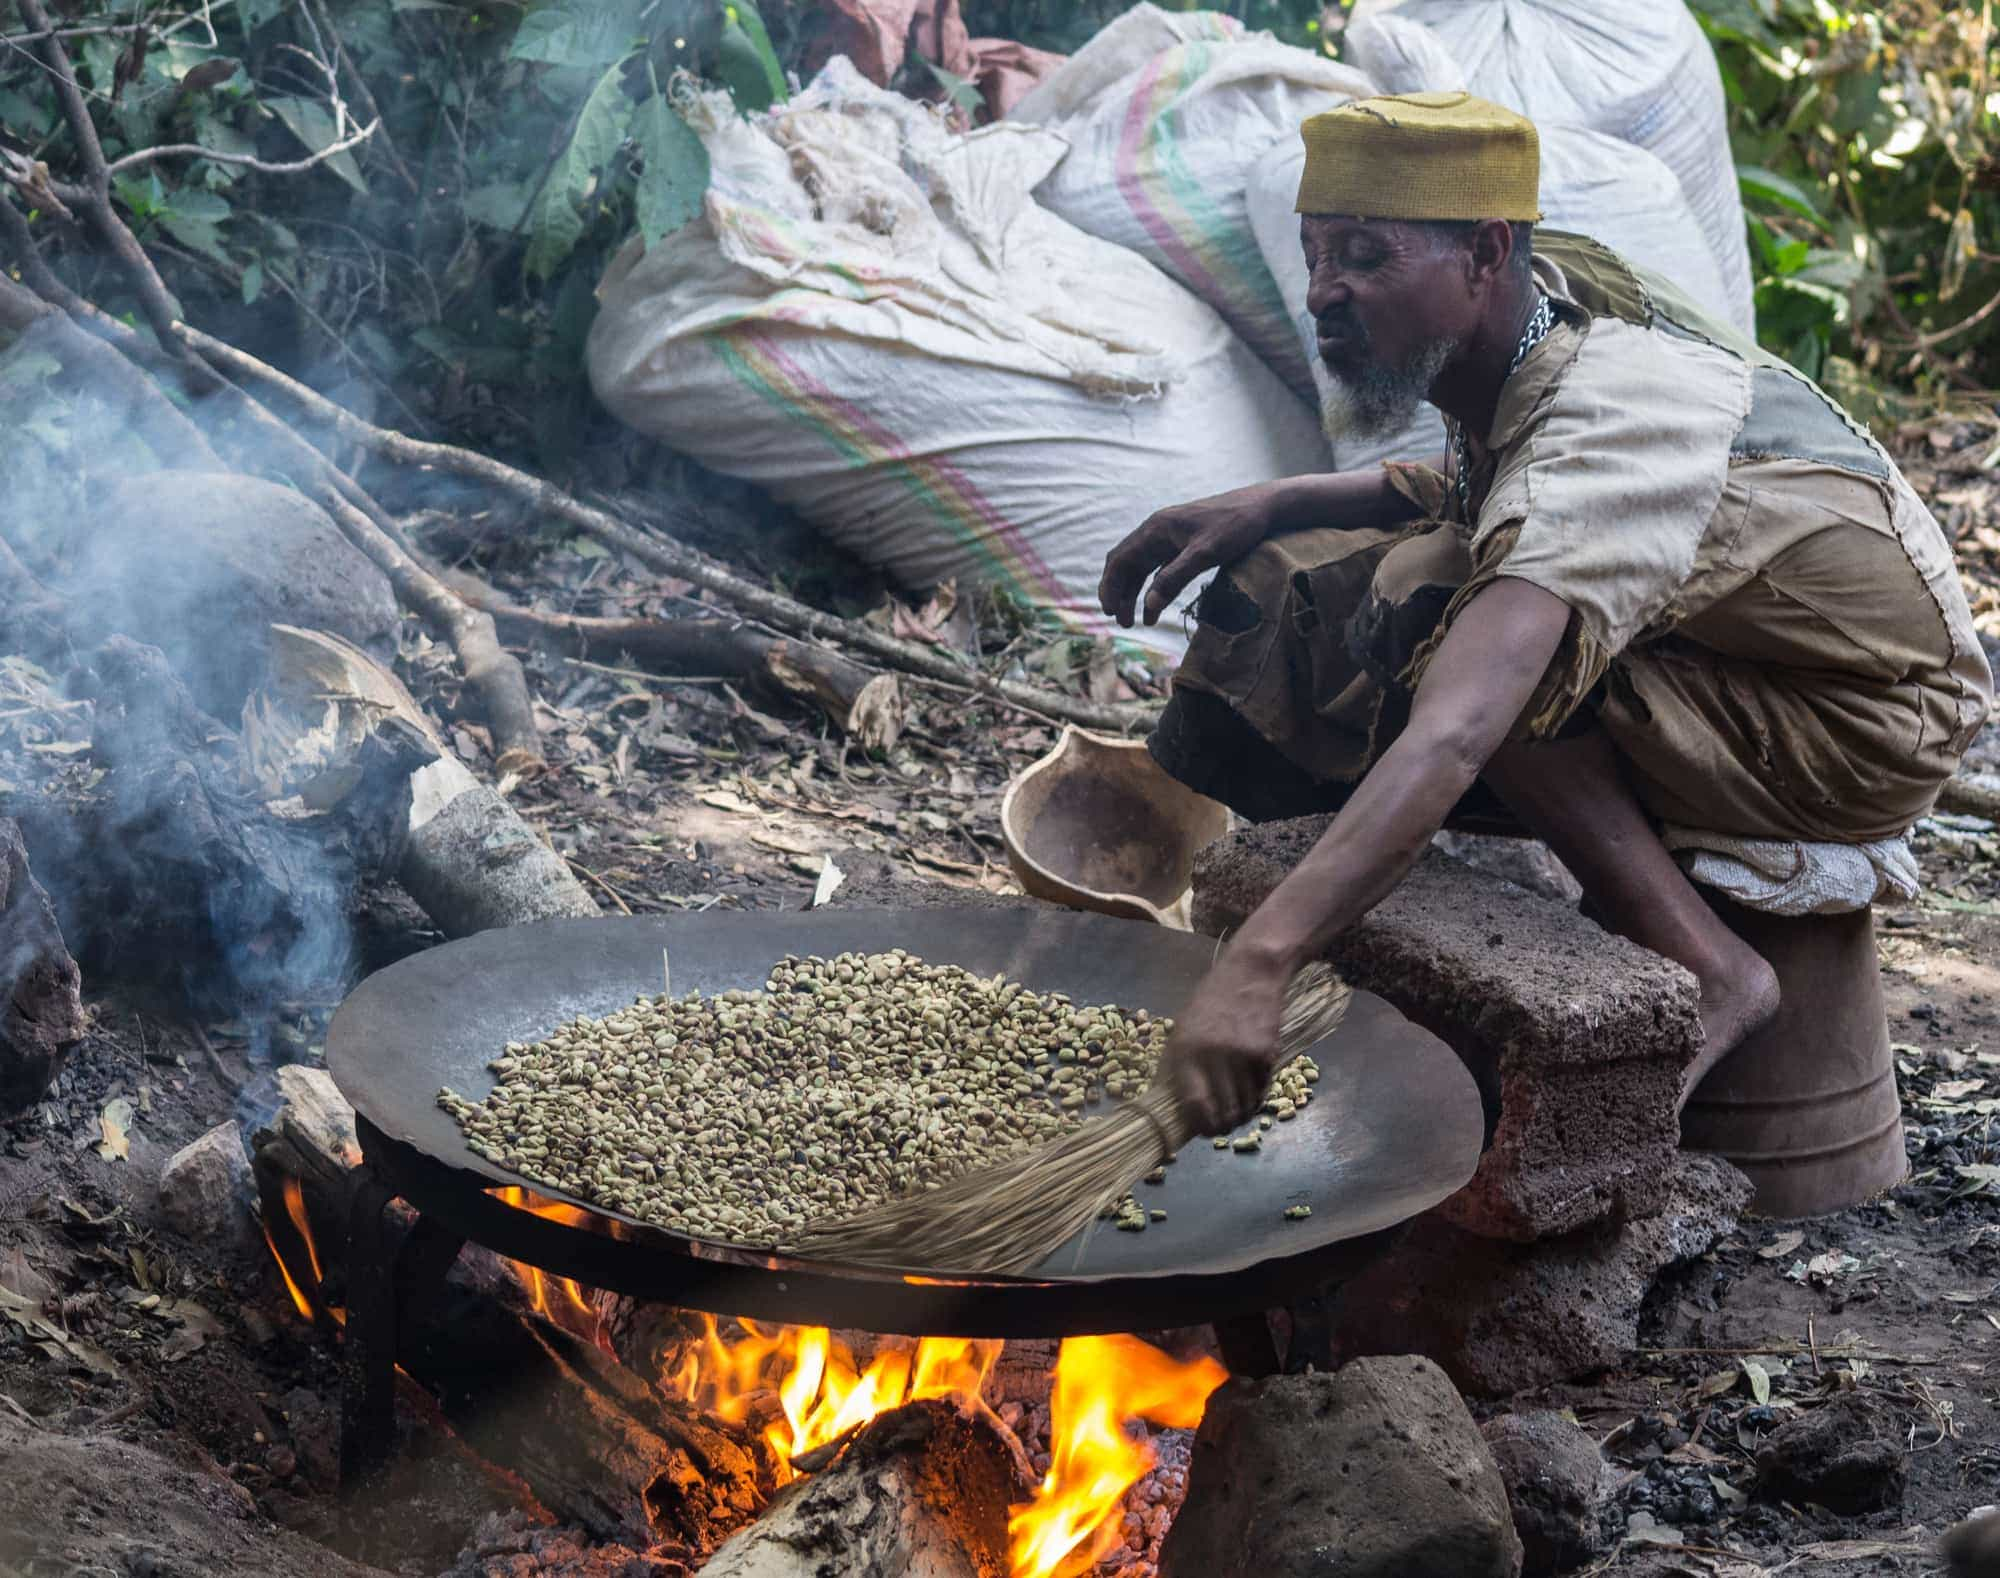 Roasting coffee beans in the ethiopian way